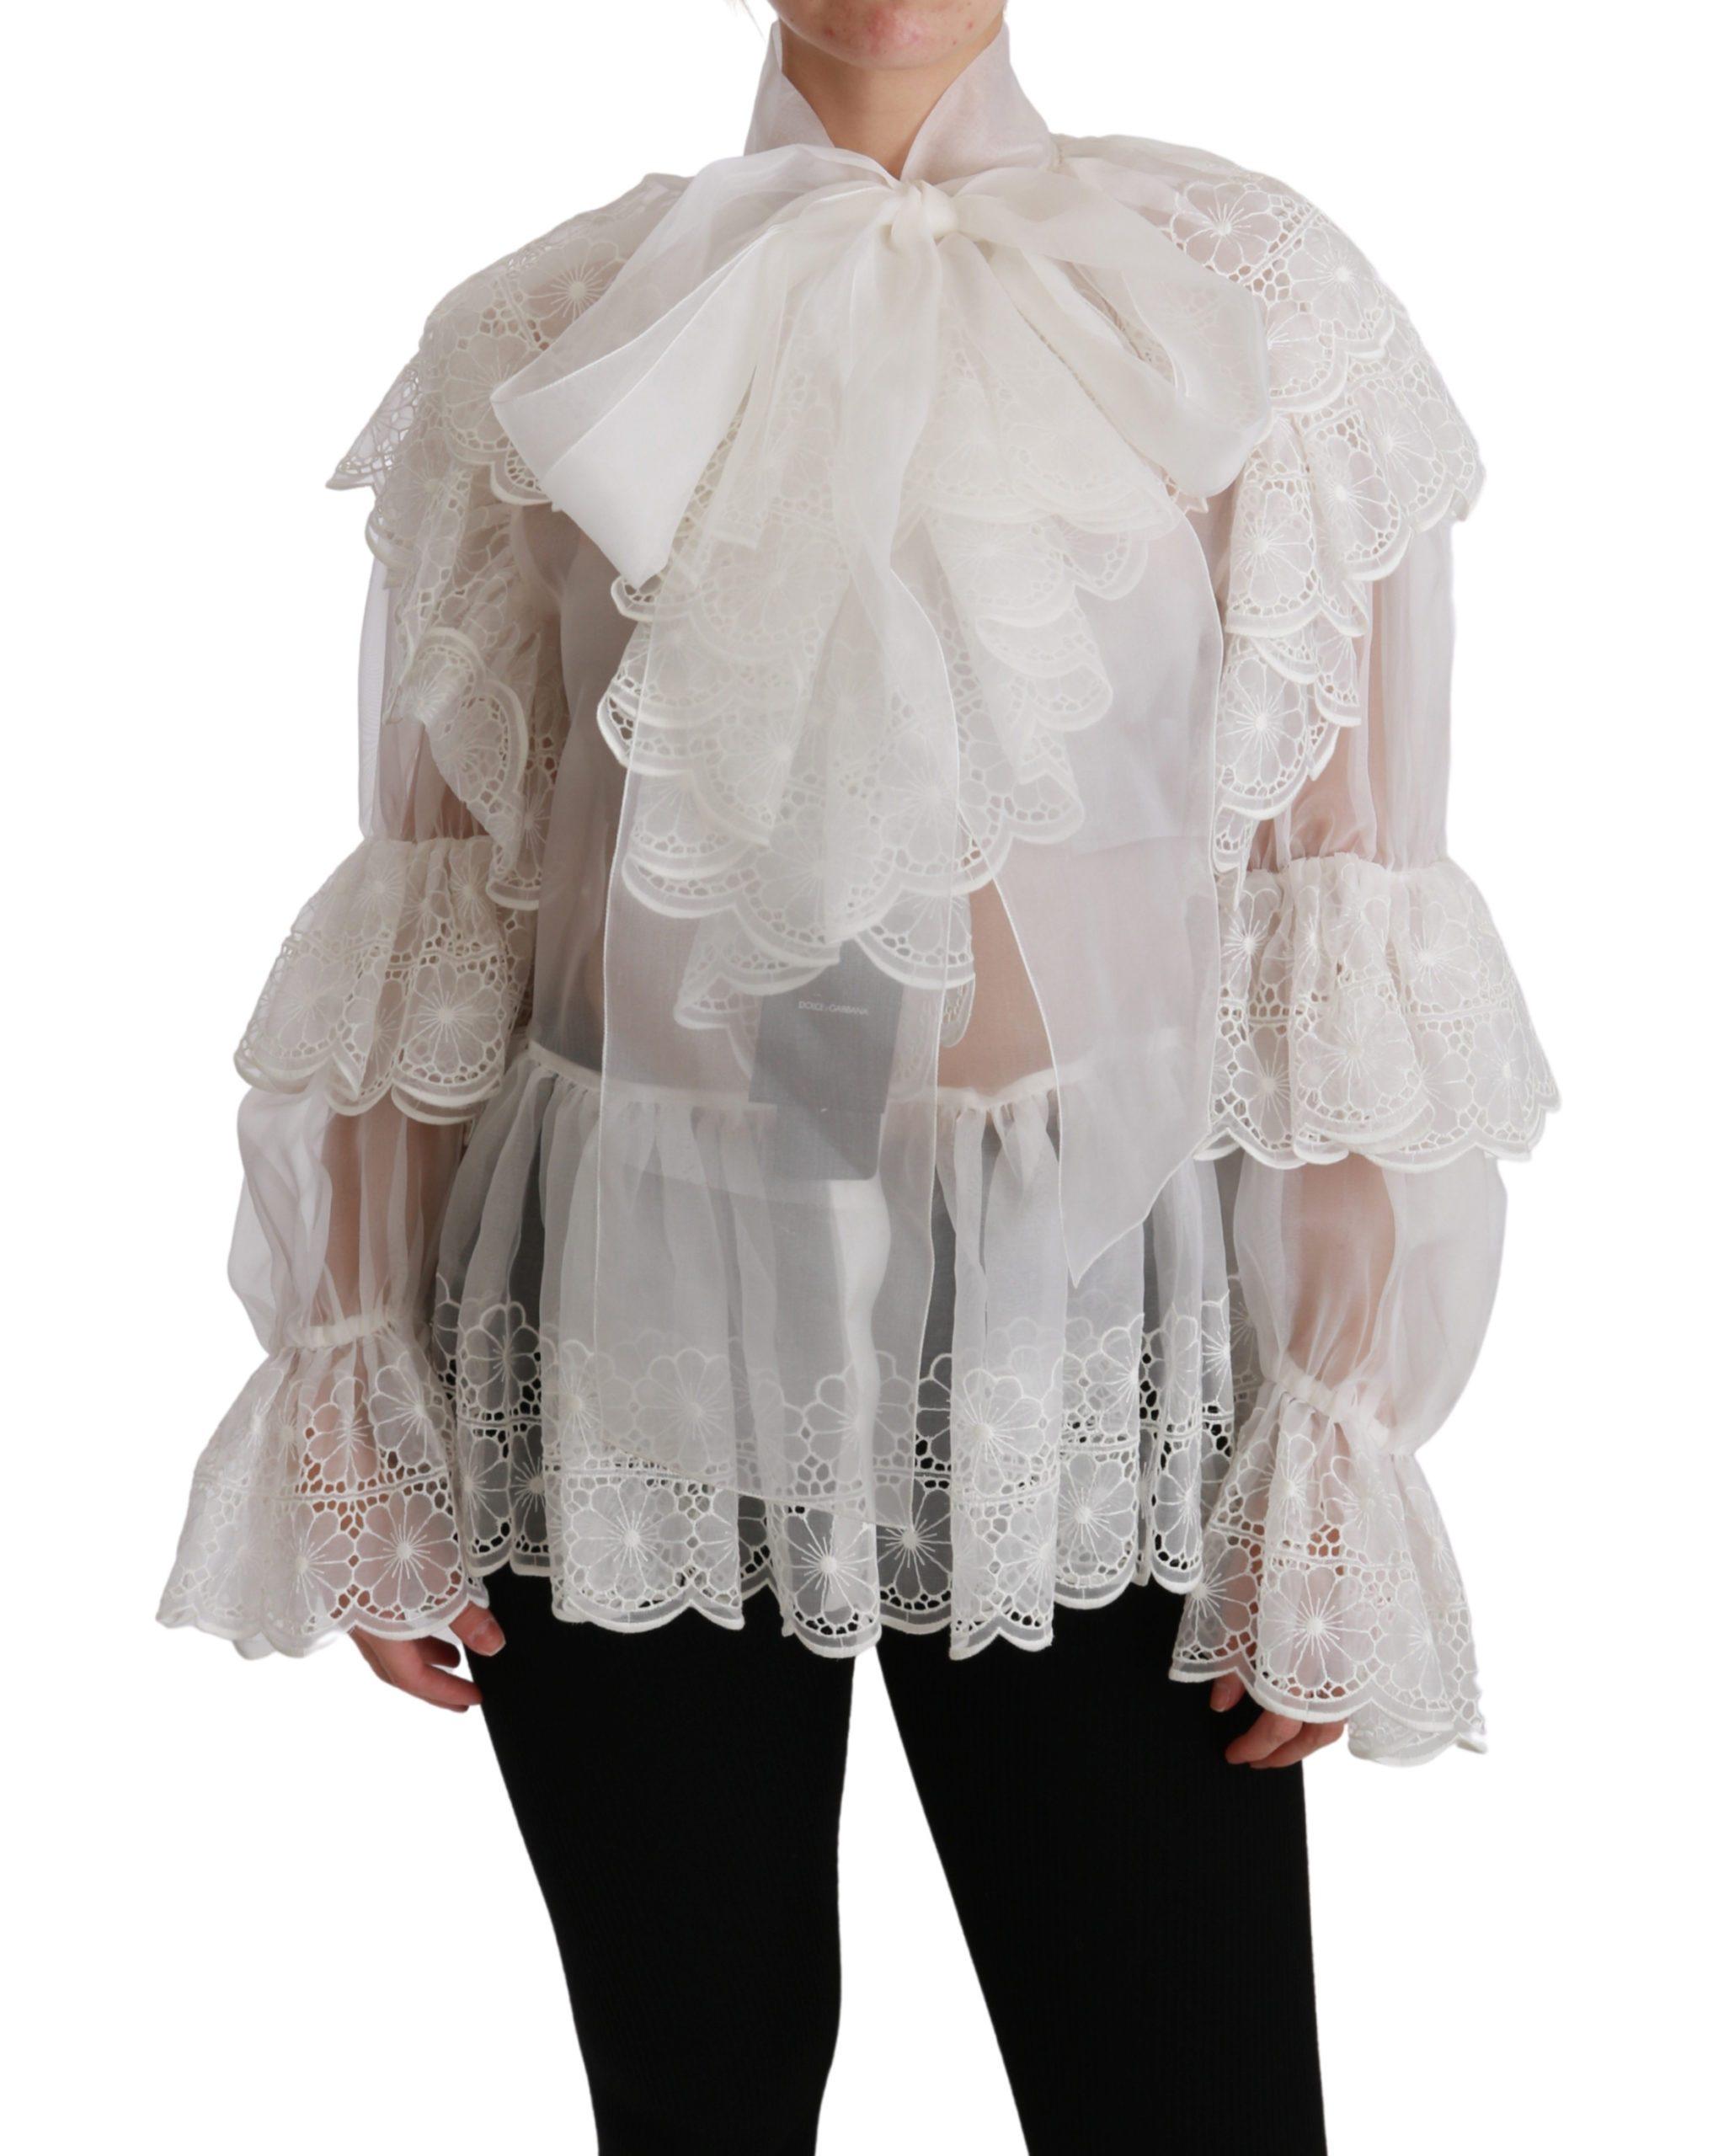 Dolce & Gabbana Women's Lace Long Sleeve Top White TSH4484 - IT40|S